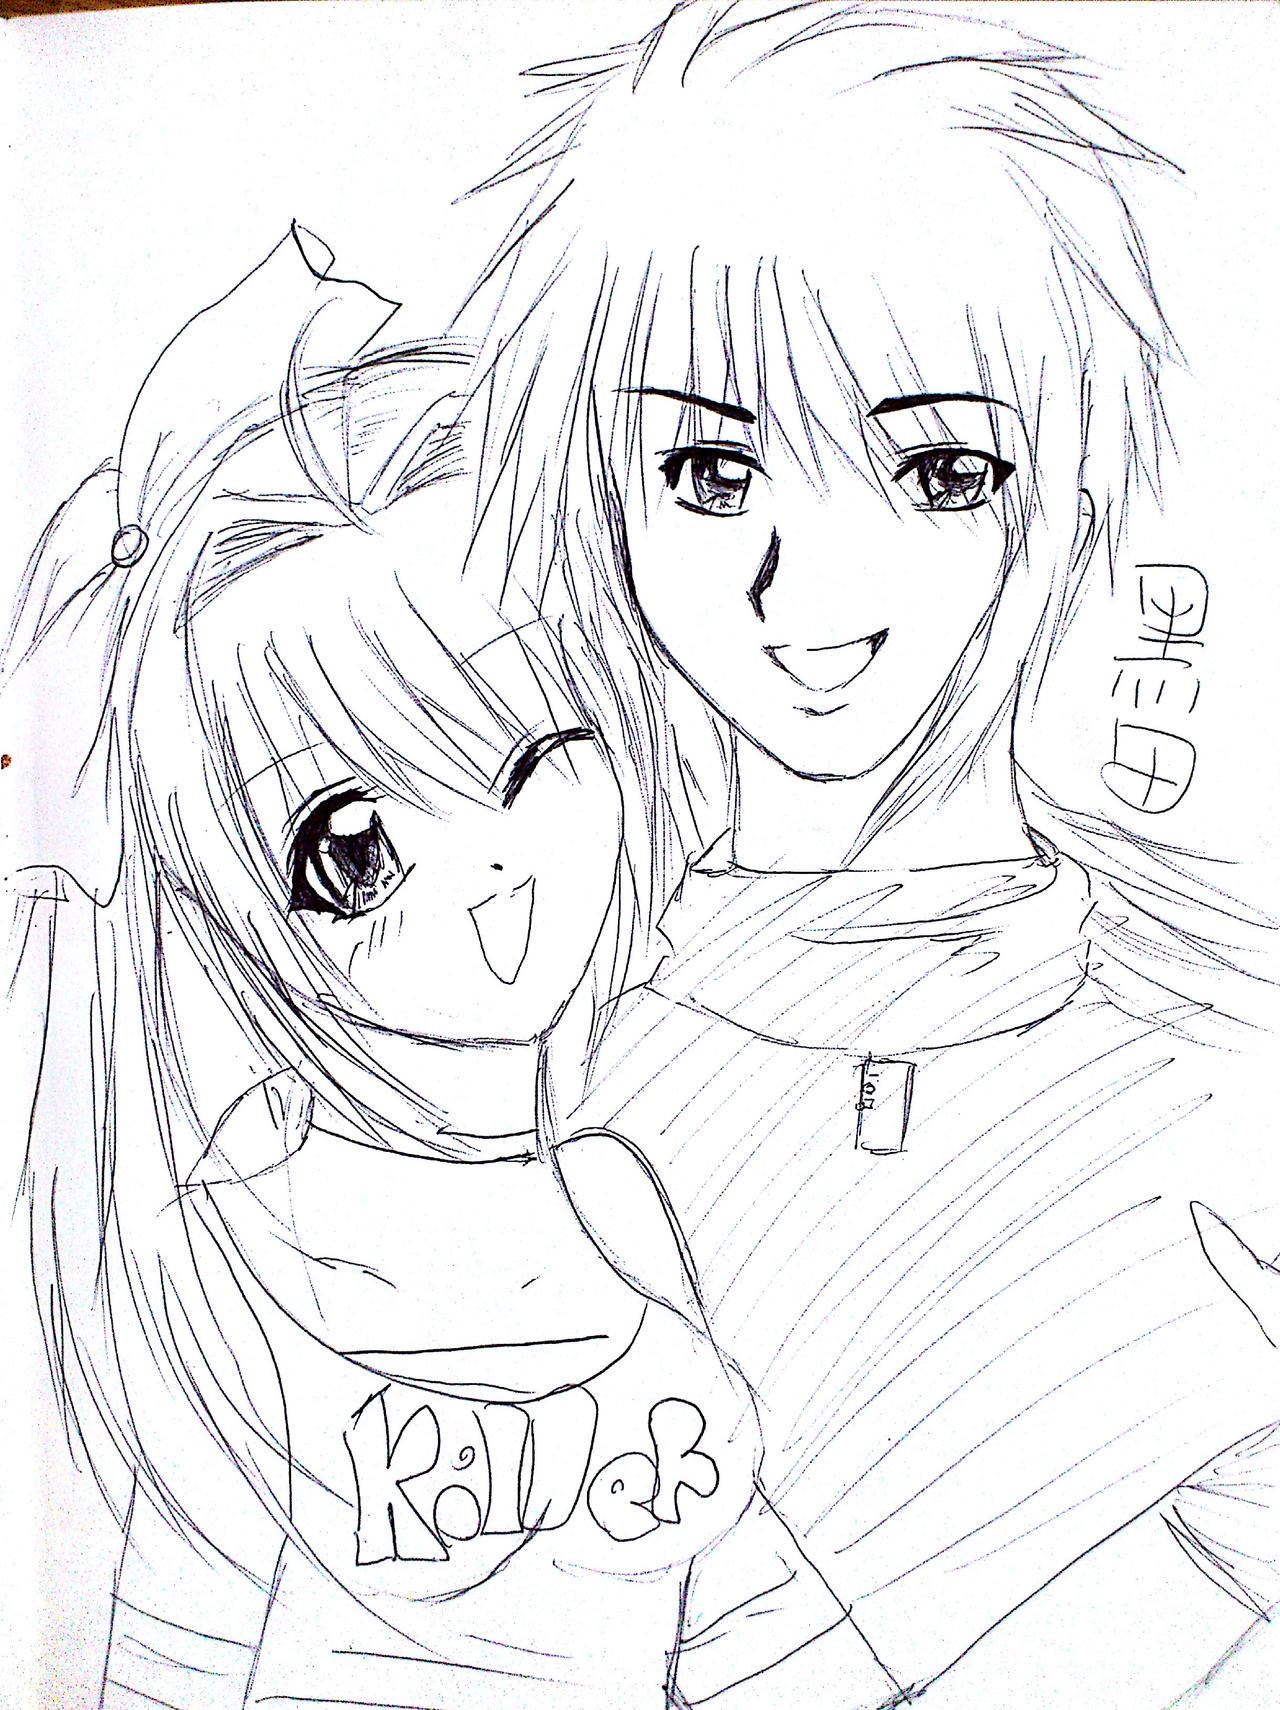 Anime Drawings - Anime Drawings By Irihime 3Chan Blqa